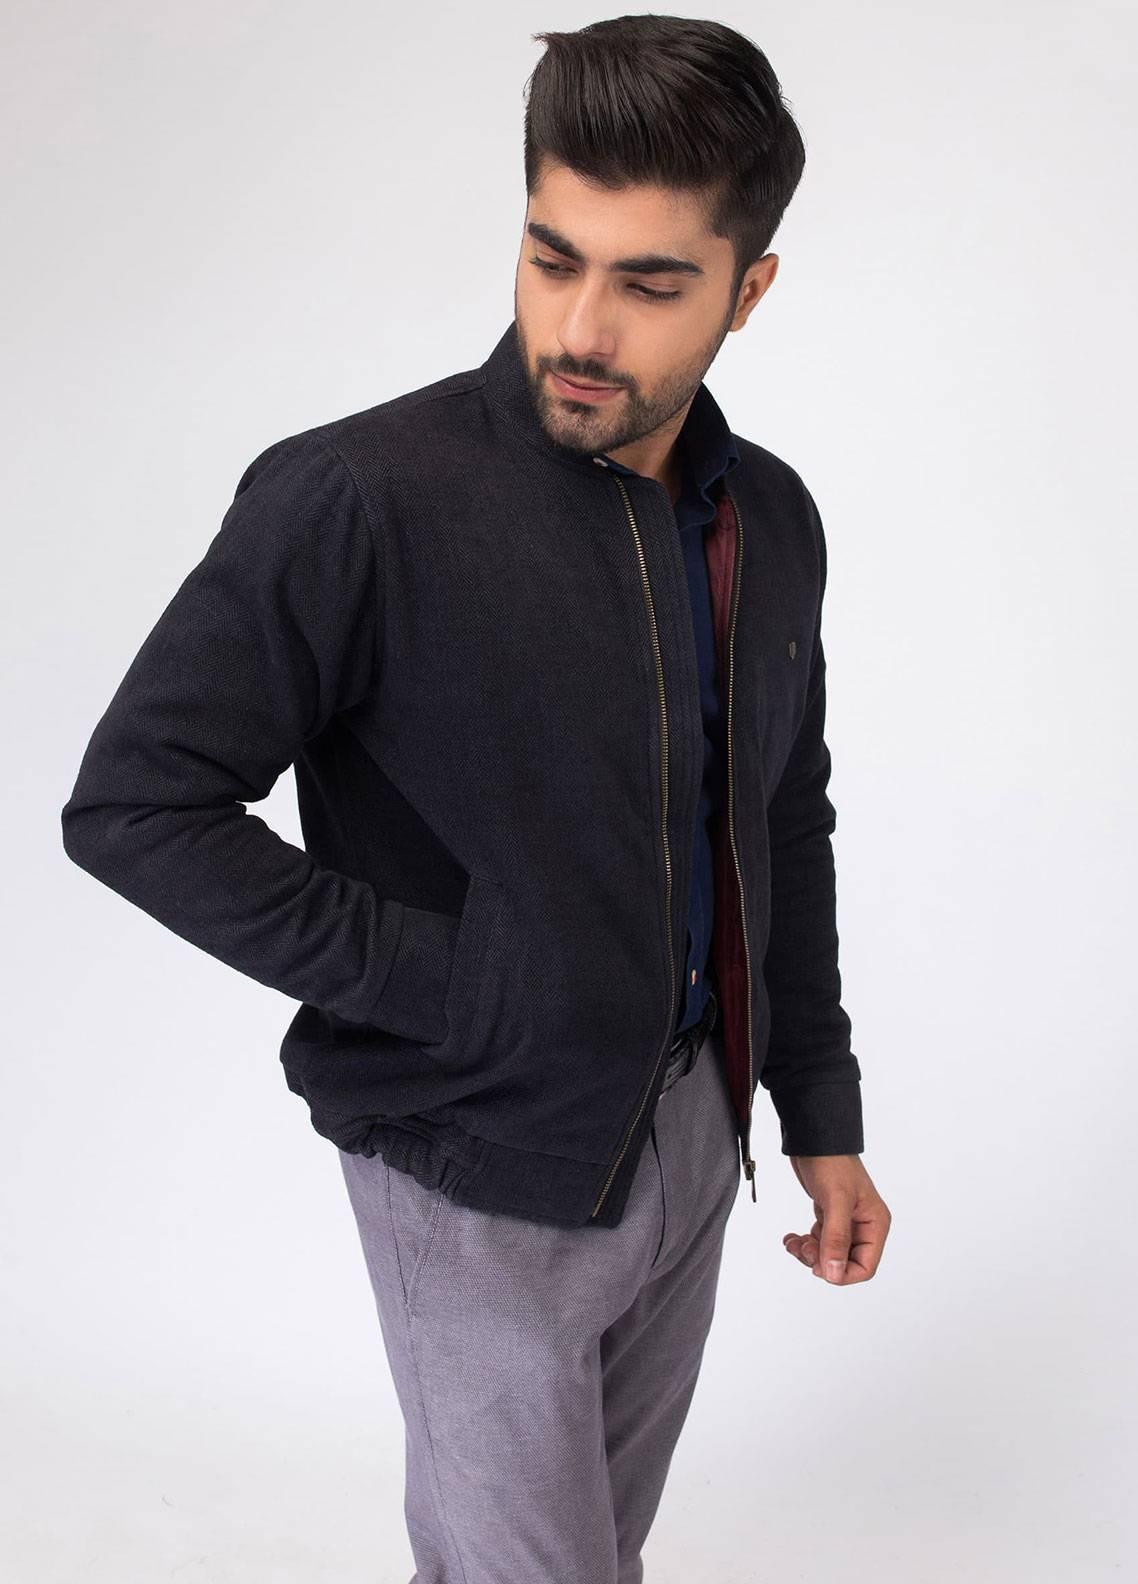 Brumano Cotton Full Sleeves Jackets for Men - Black BRM-11-0692